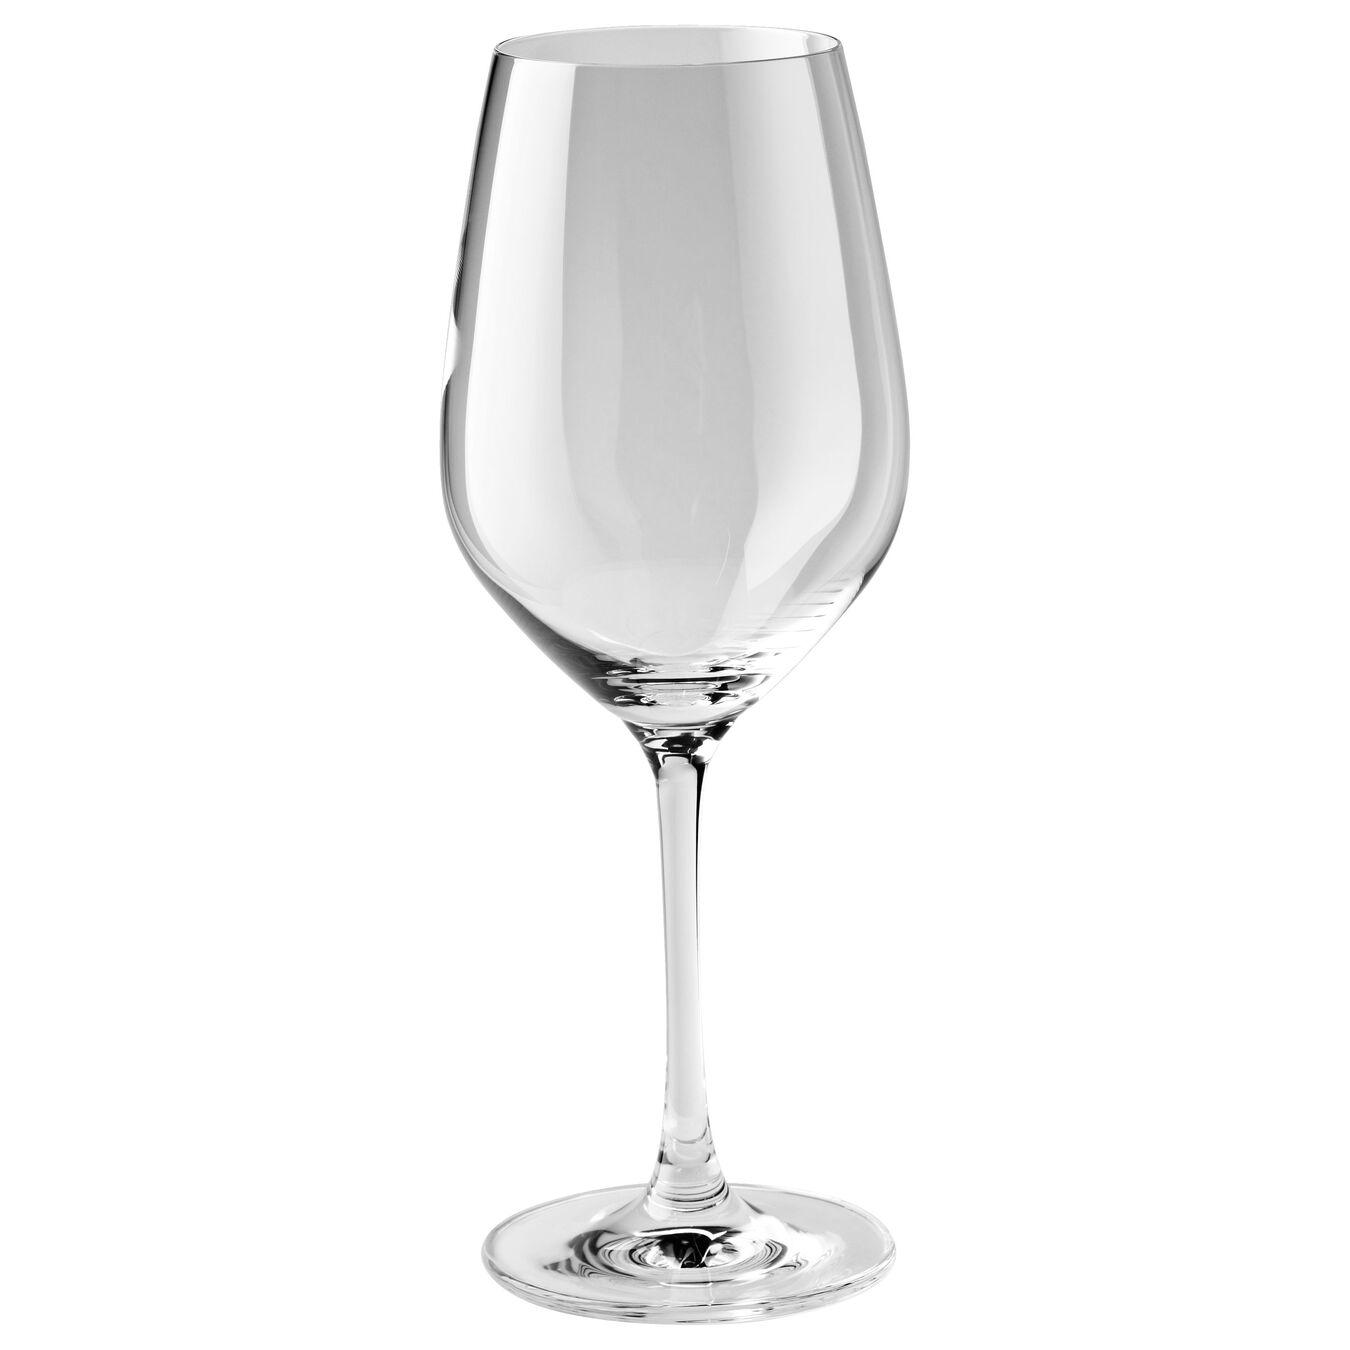 Rotweinglas 400 ml,,large 1